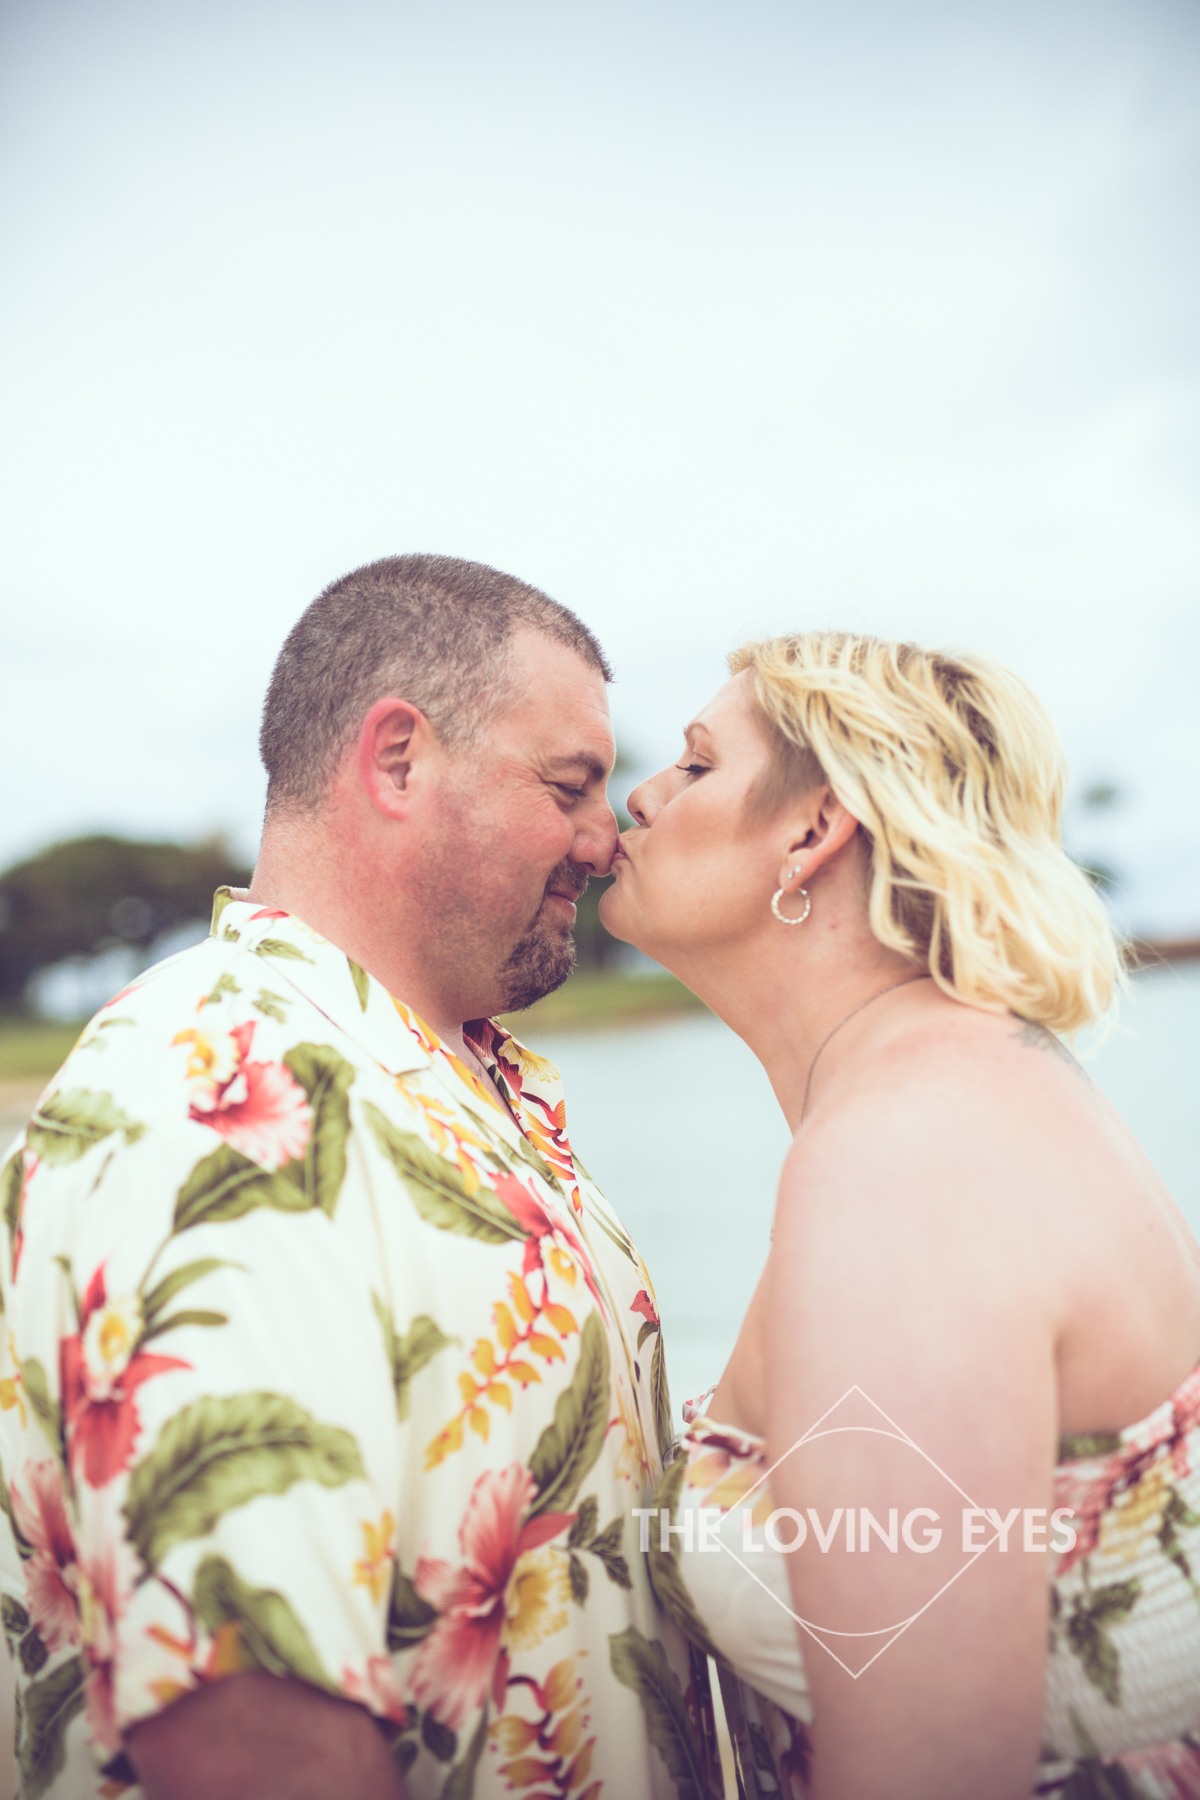 Kissing on the beach during Hawaii vacation at Ala Moana Beach Park